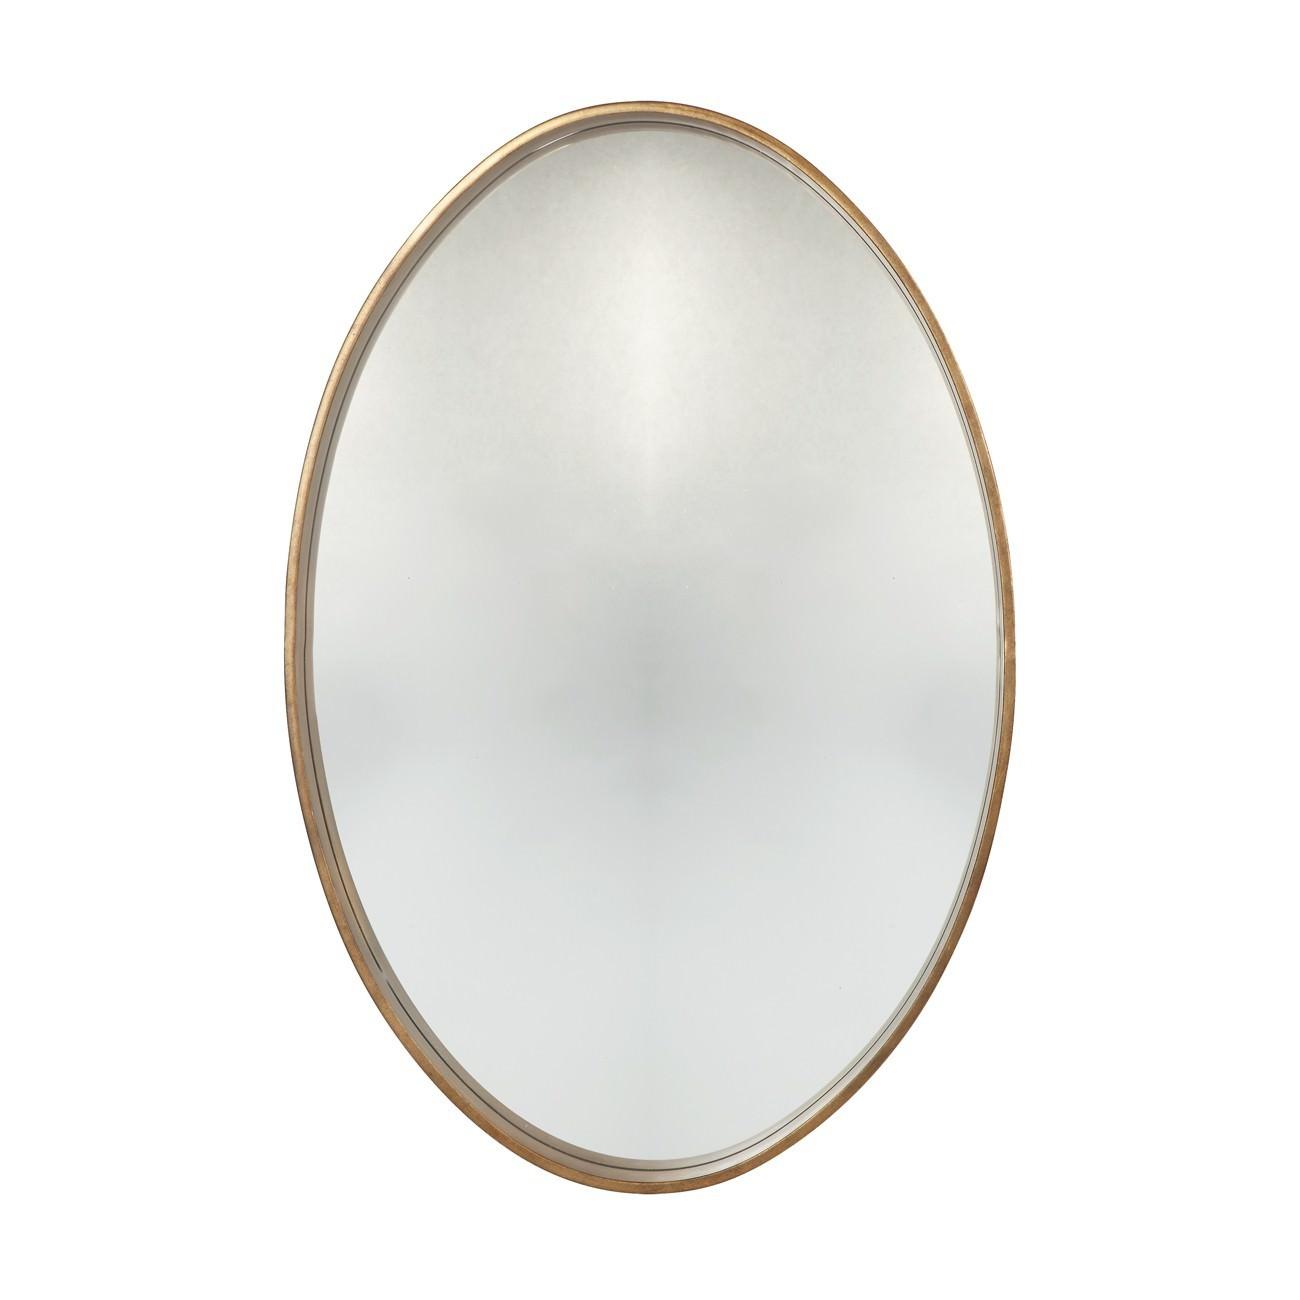 Destiny Iron Framed Wall Mirror, 90cm